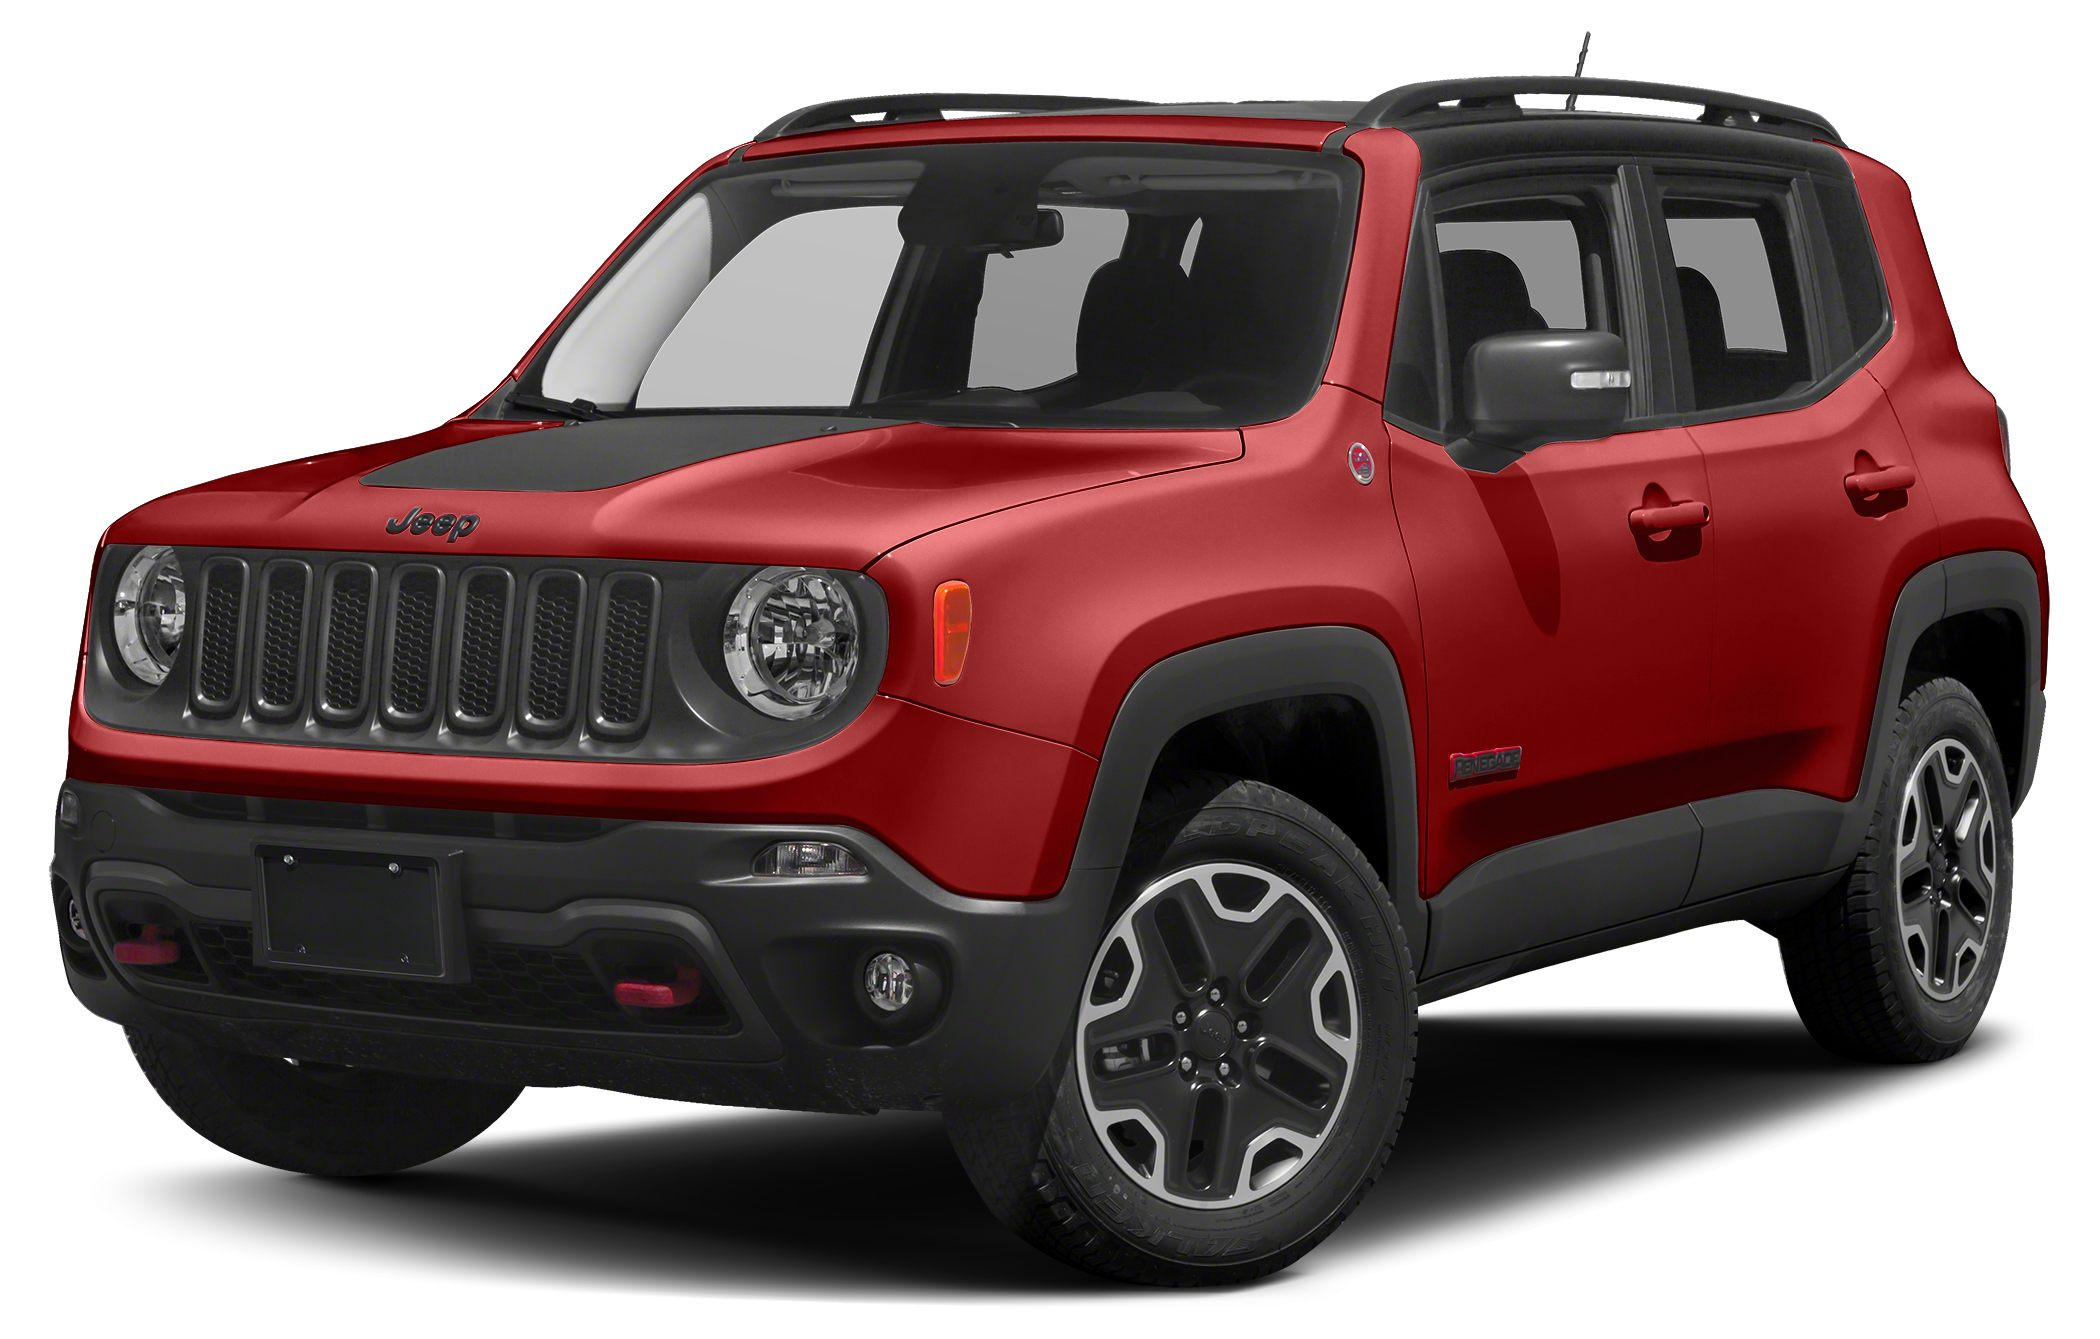 2016 Jeep Renegade Trailhawk Color Colorado Red Stock GPE20278 VIN ZACCJBCT6GPE20278